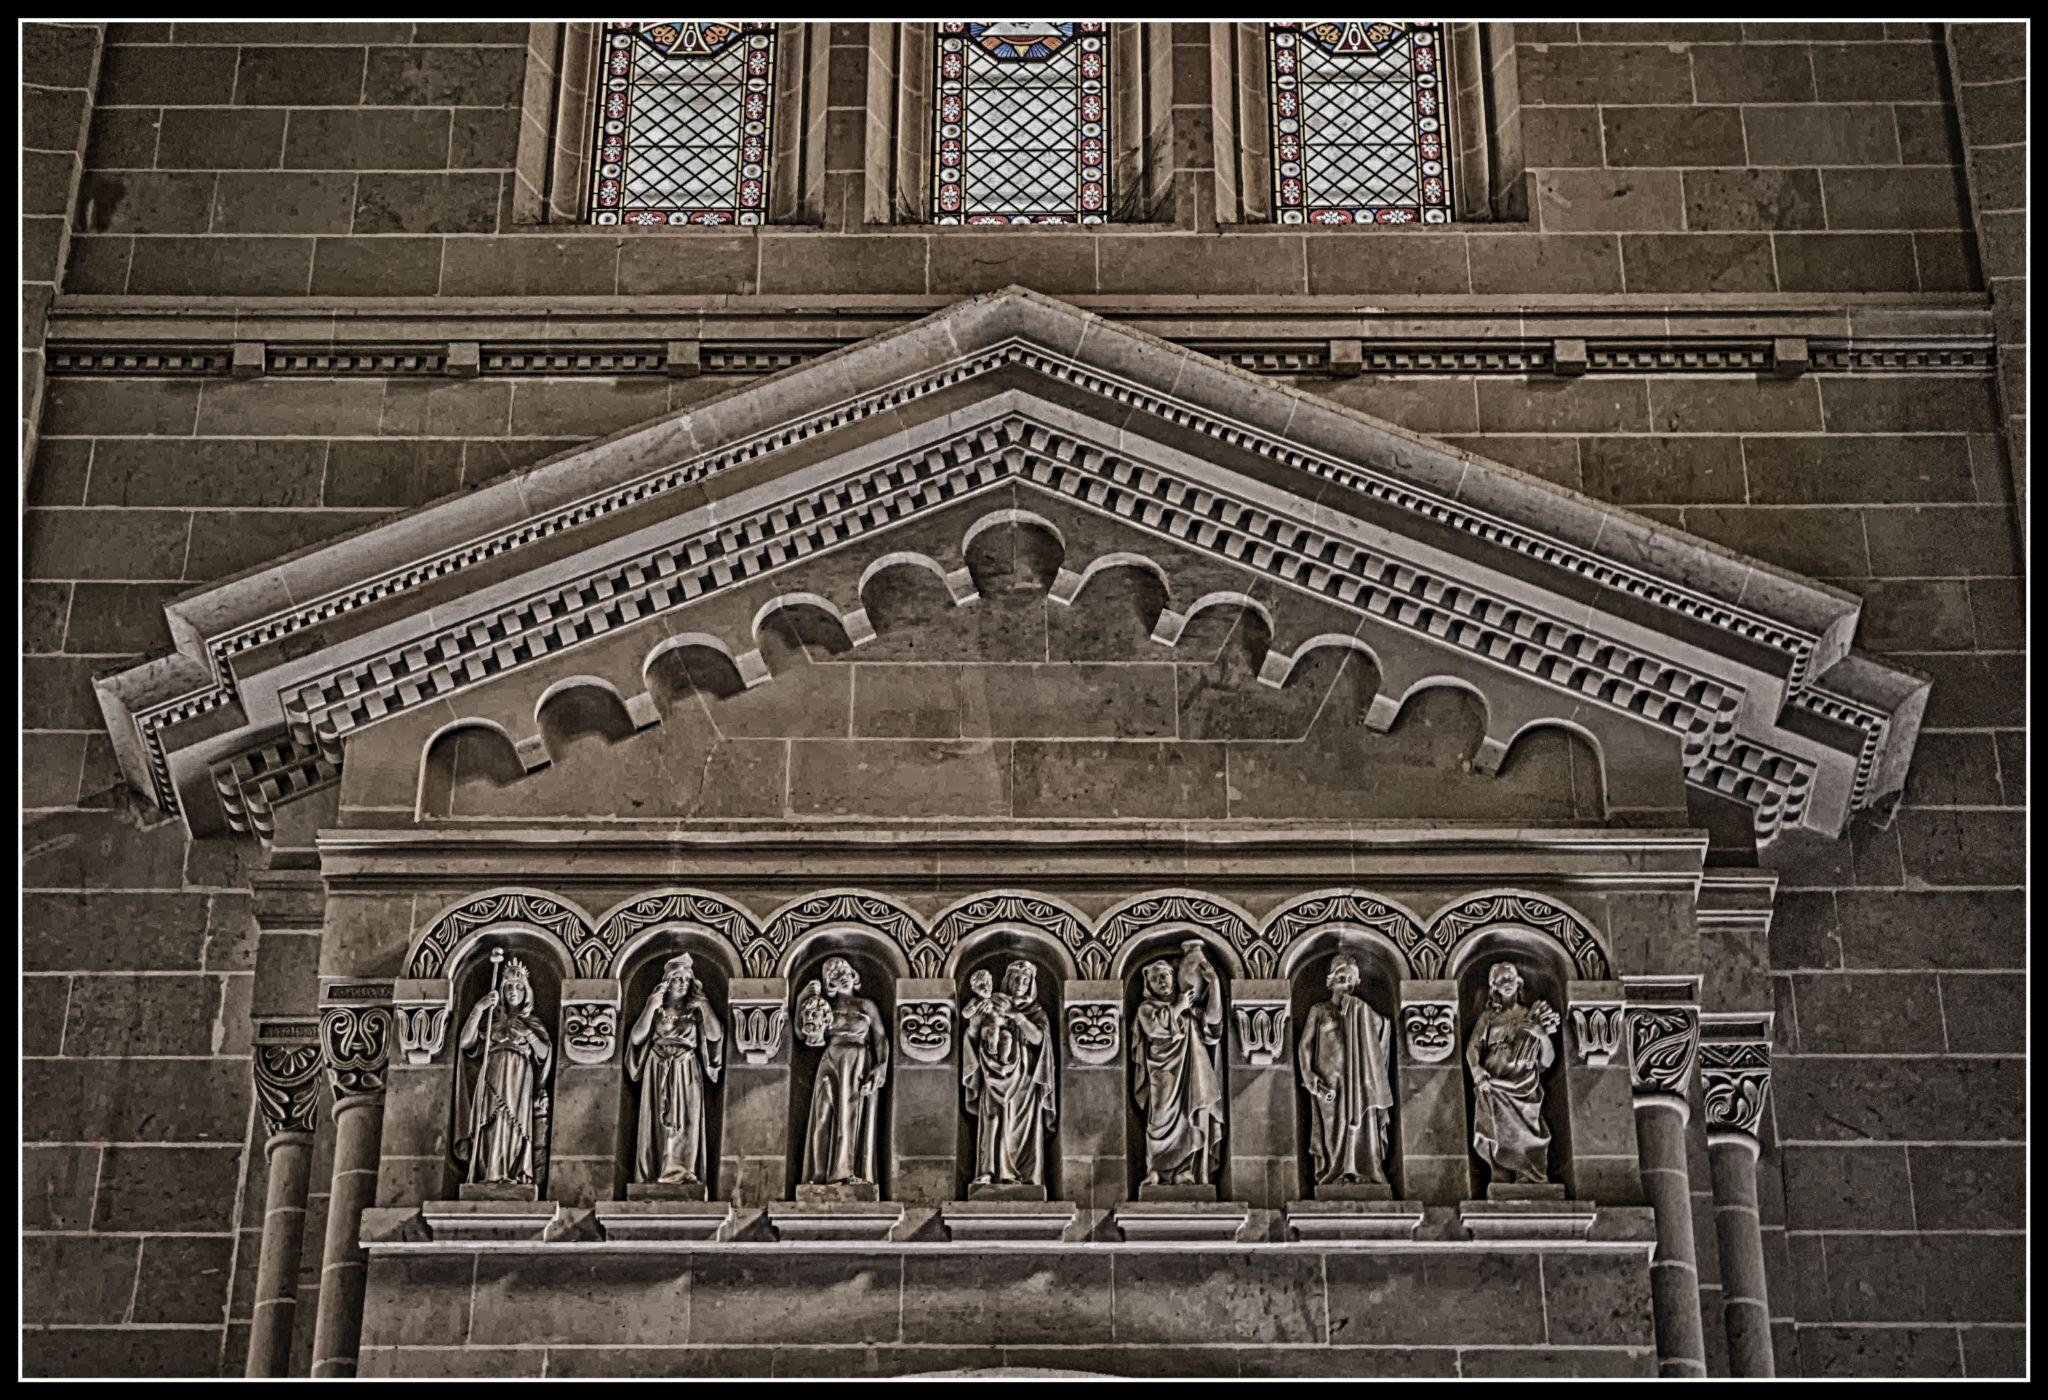 Saints Statues by Anthony Bonnici